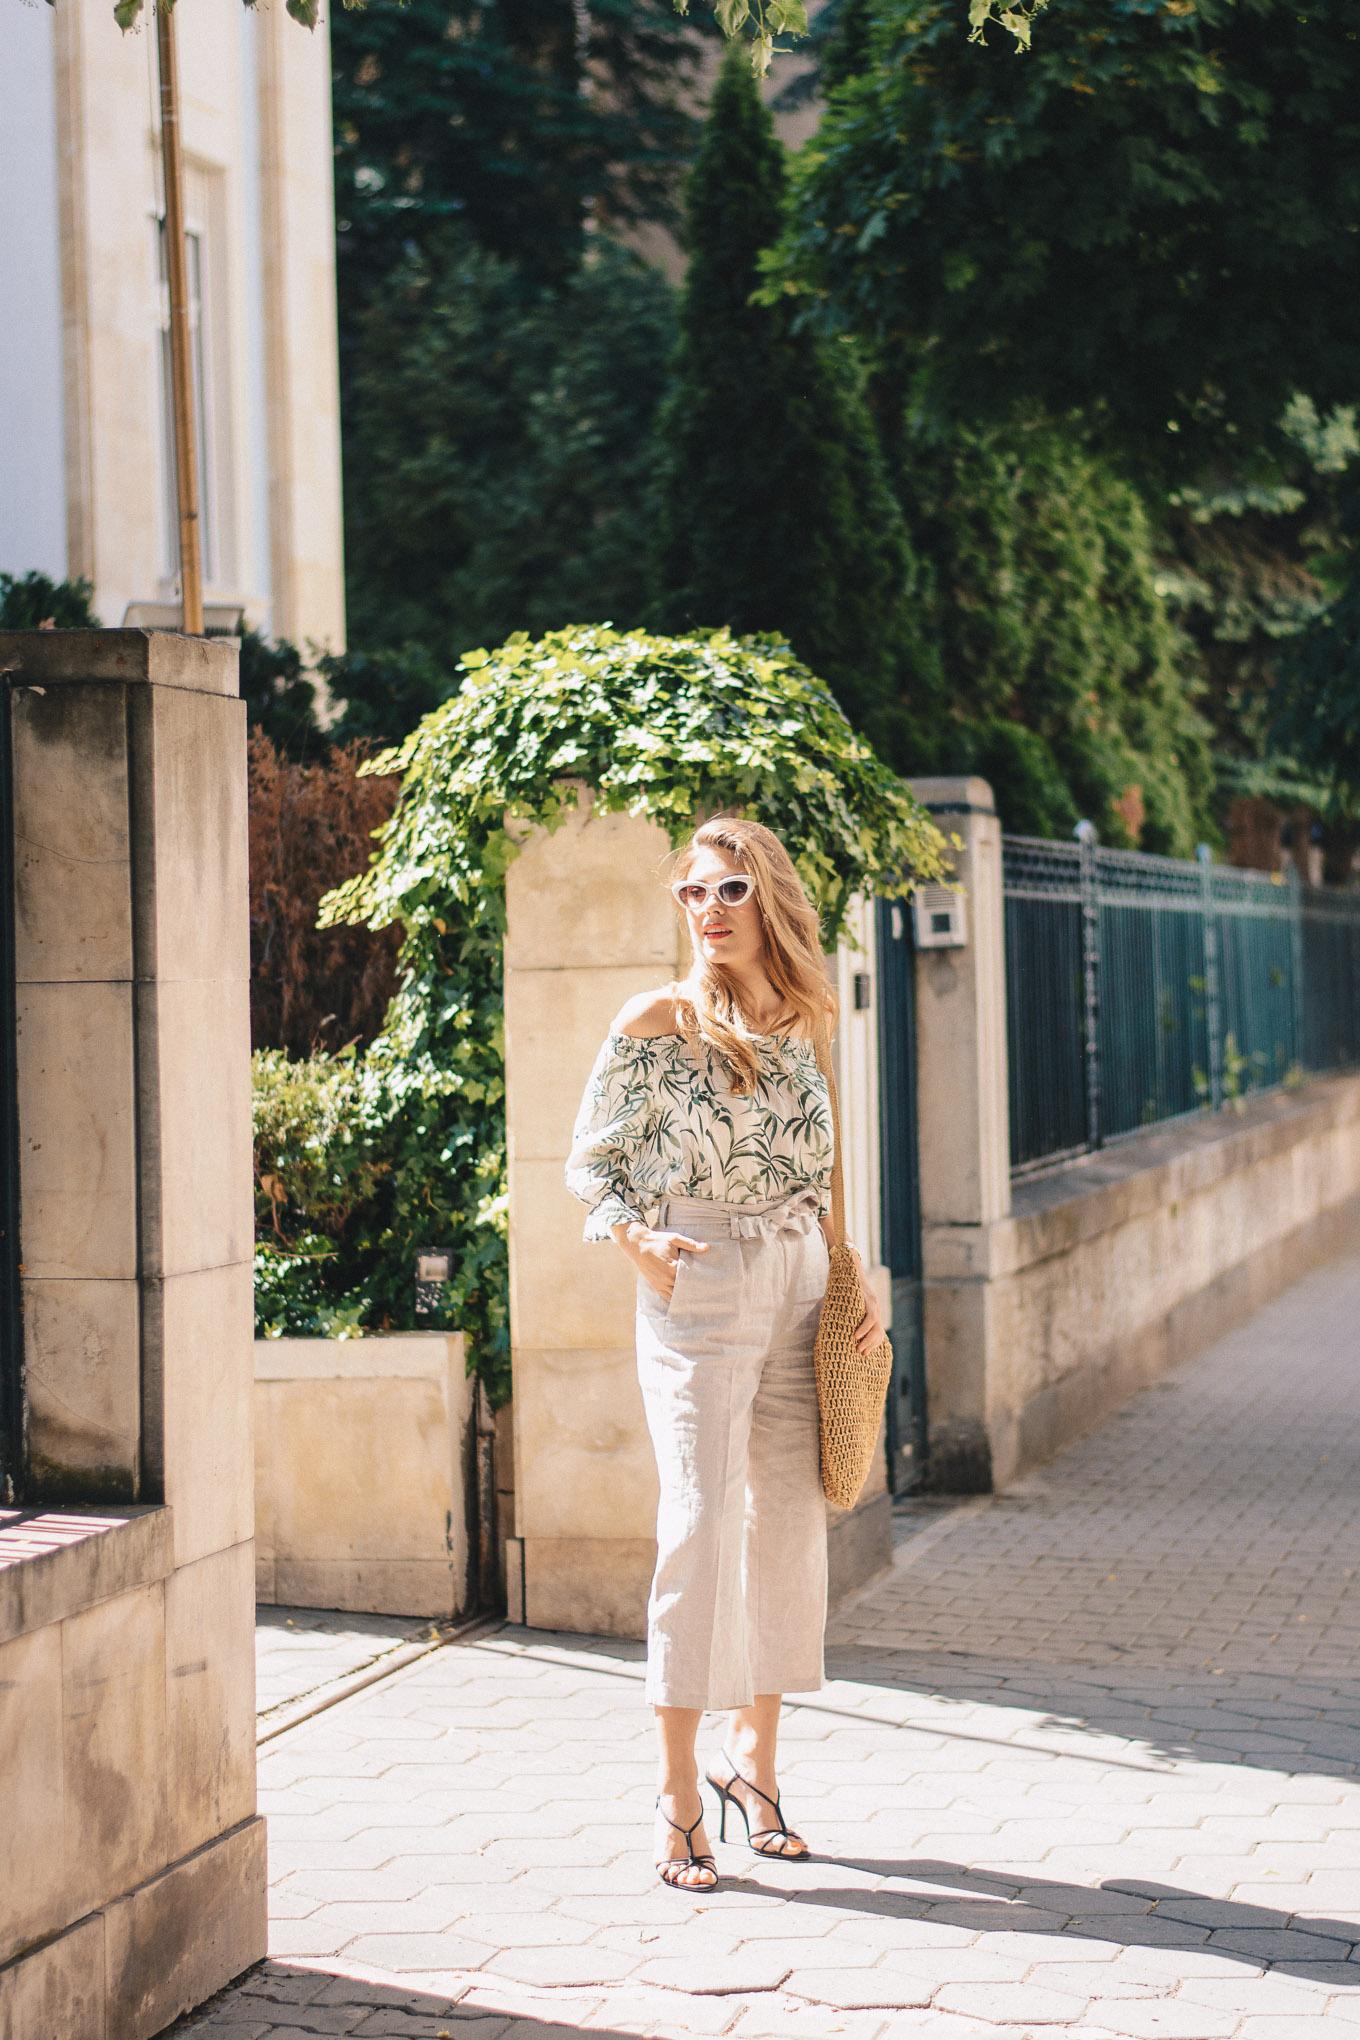 Bulgarian influencer Денина Мартин